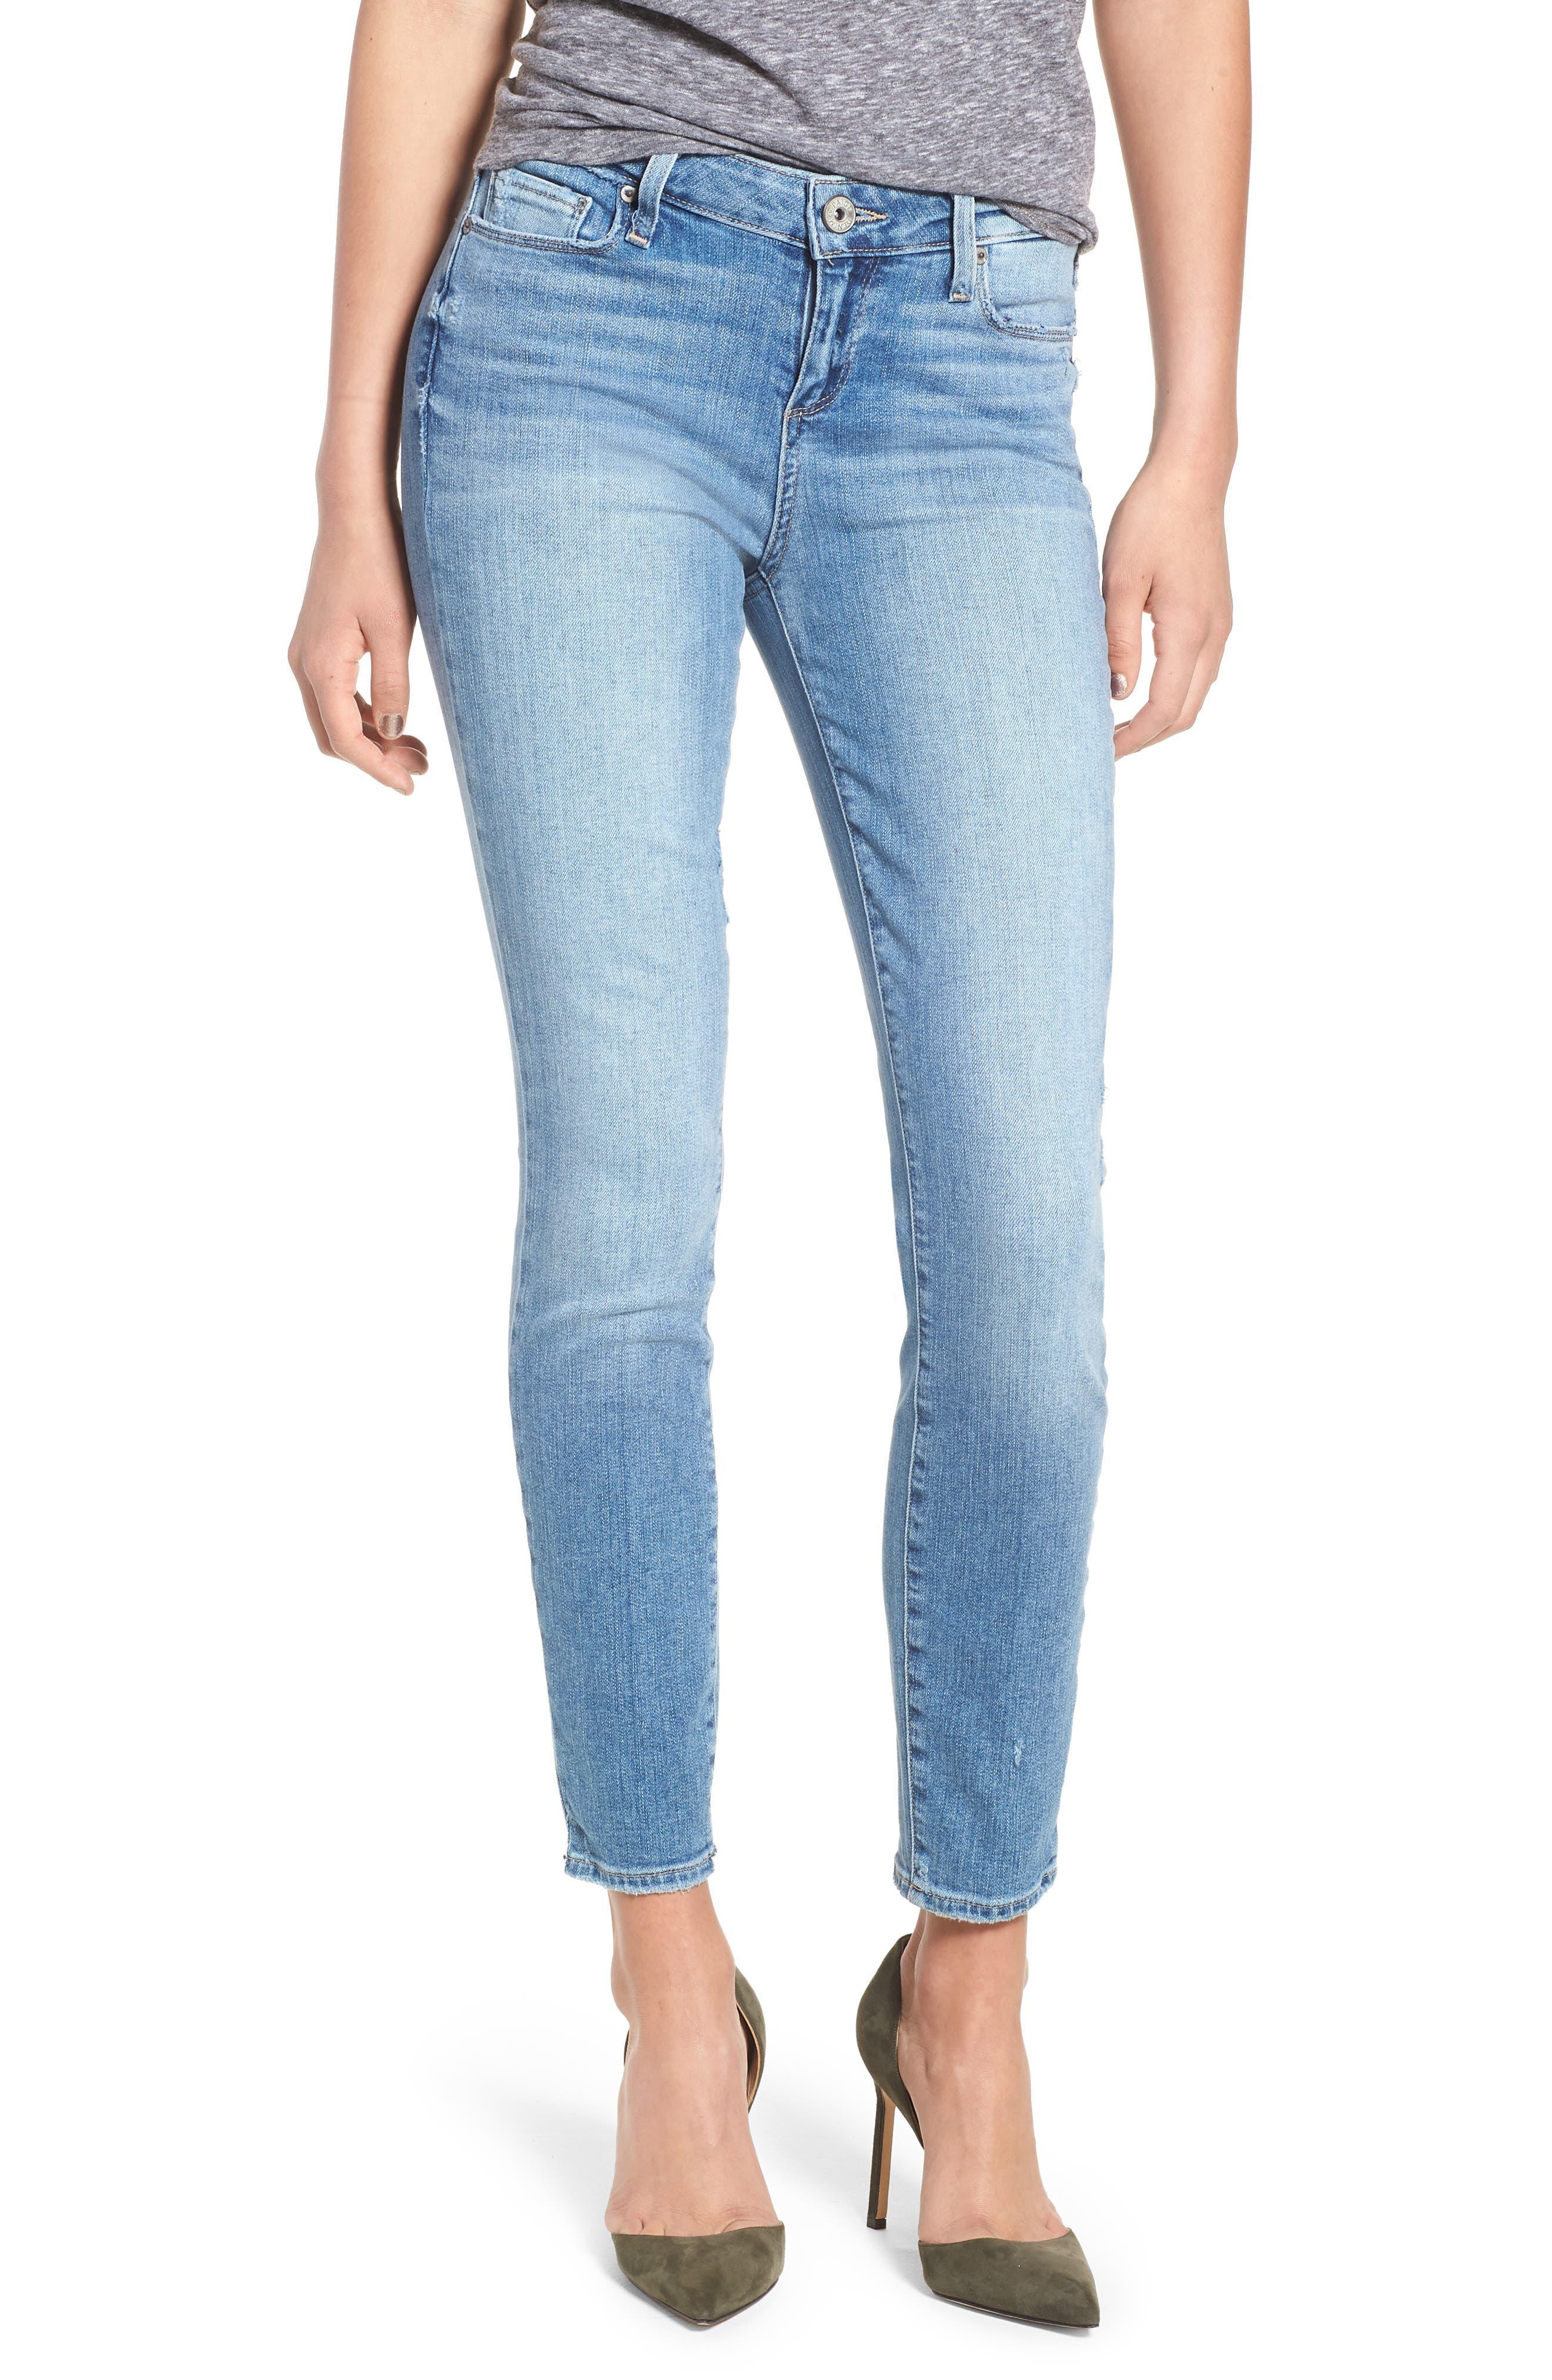 Transcend - Verdugo Ankle Ultra Skinny Jeans,                         Main,                         color, Soto